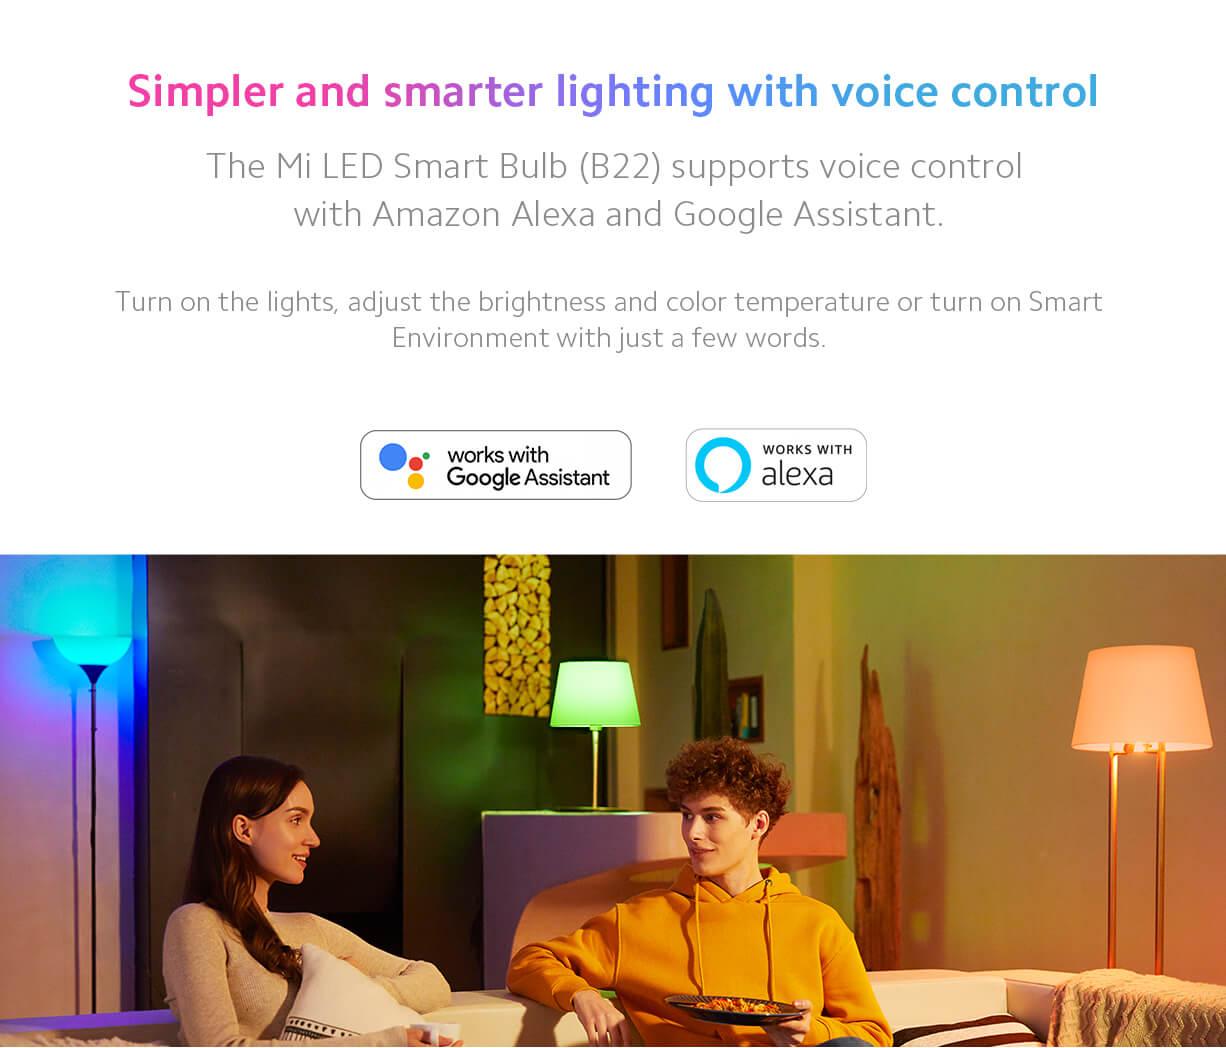 Mi LED Voice control